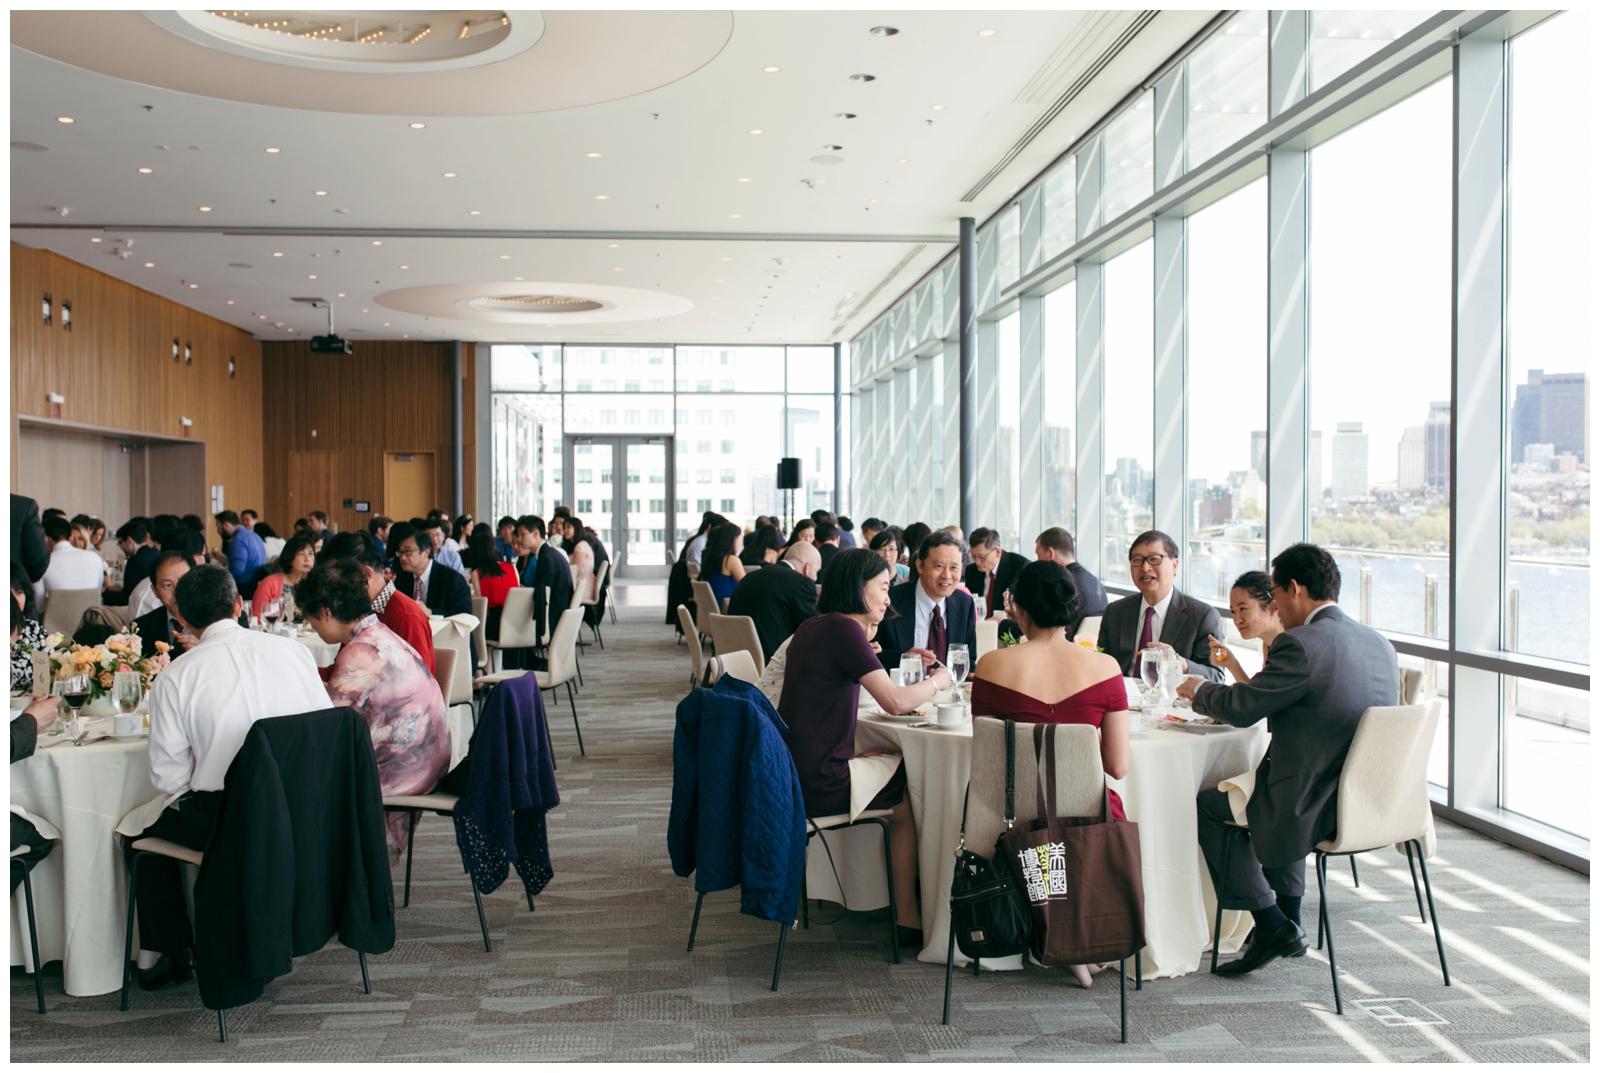 Samberg-Conference-Center-Boston-Wedding-Photographer-Bailey-Q-Photo-092.jpg